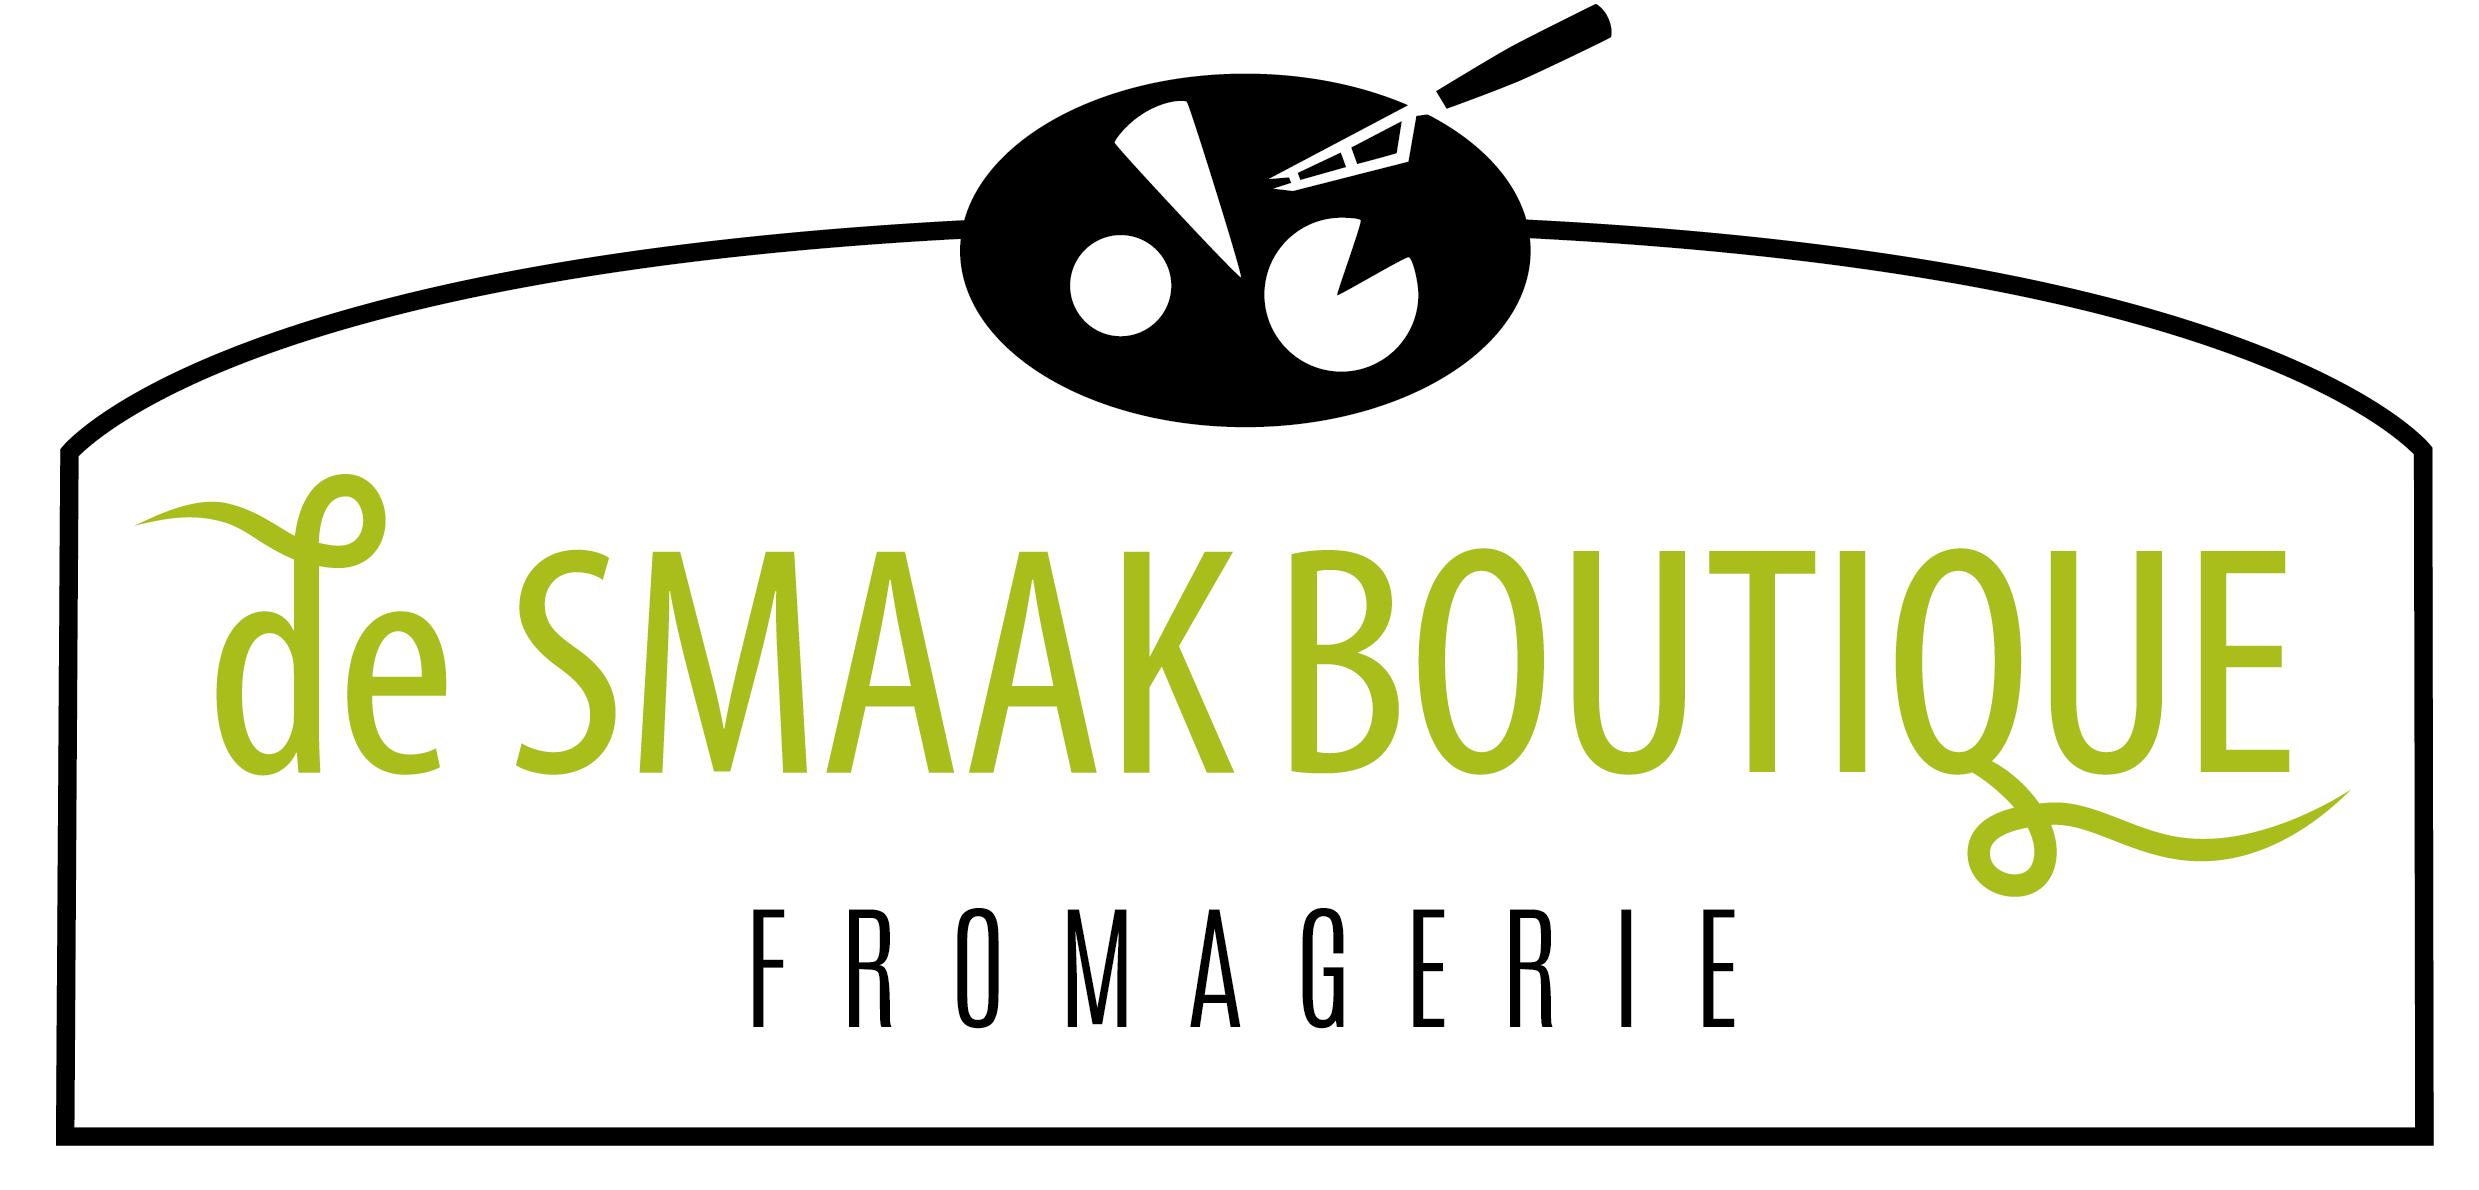 De Smaakboutique Fromagerie